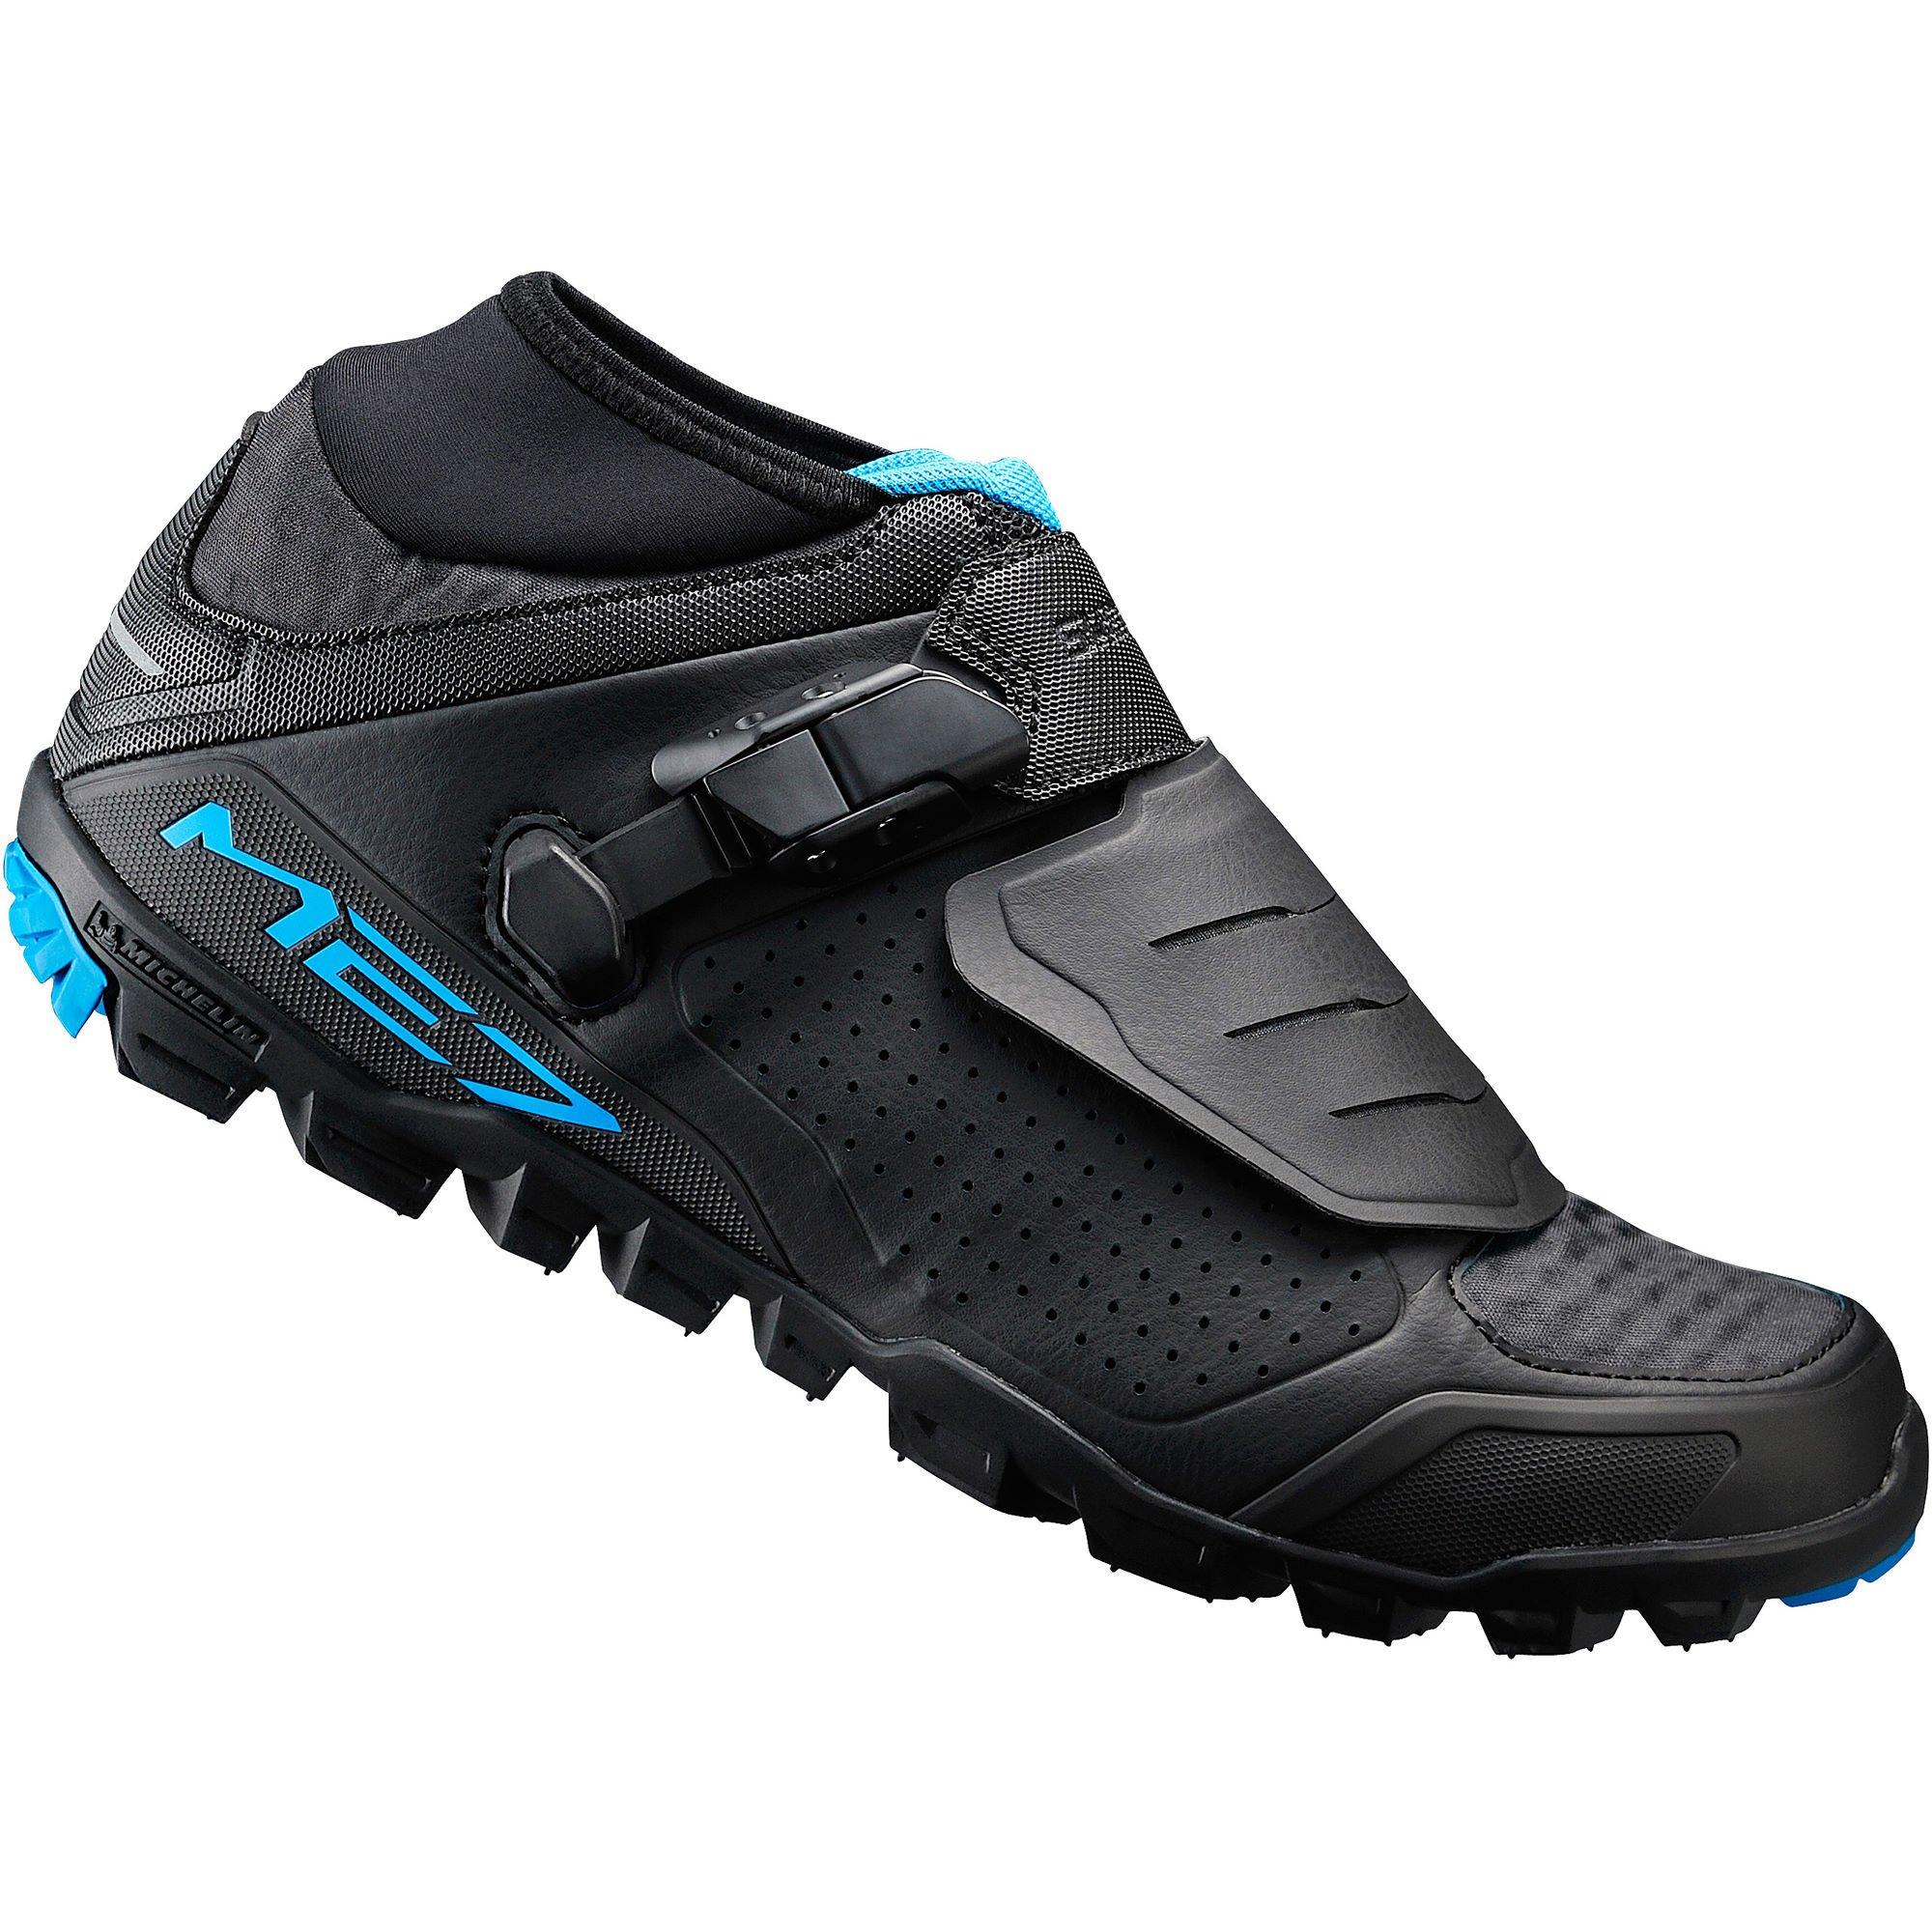 Shimano ME7 Trail/Enduro sko sort | Sko